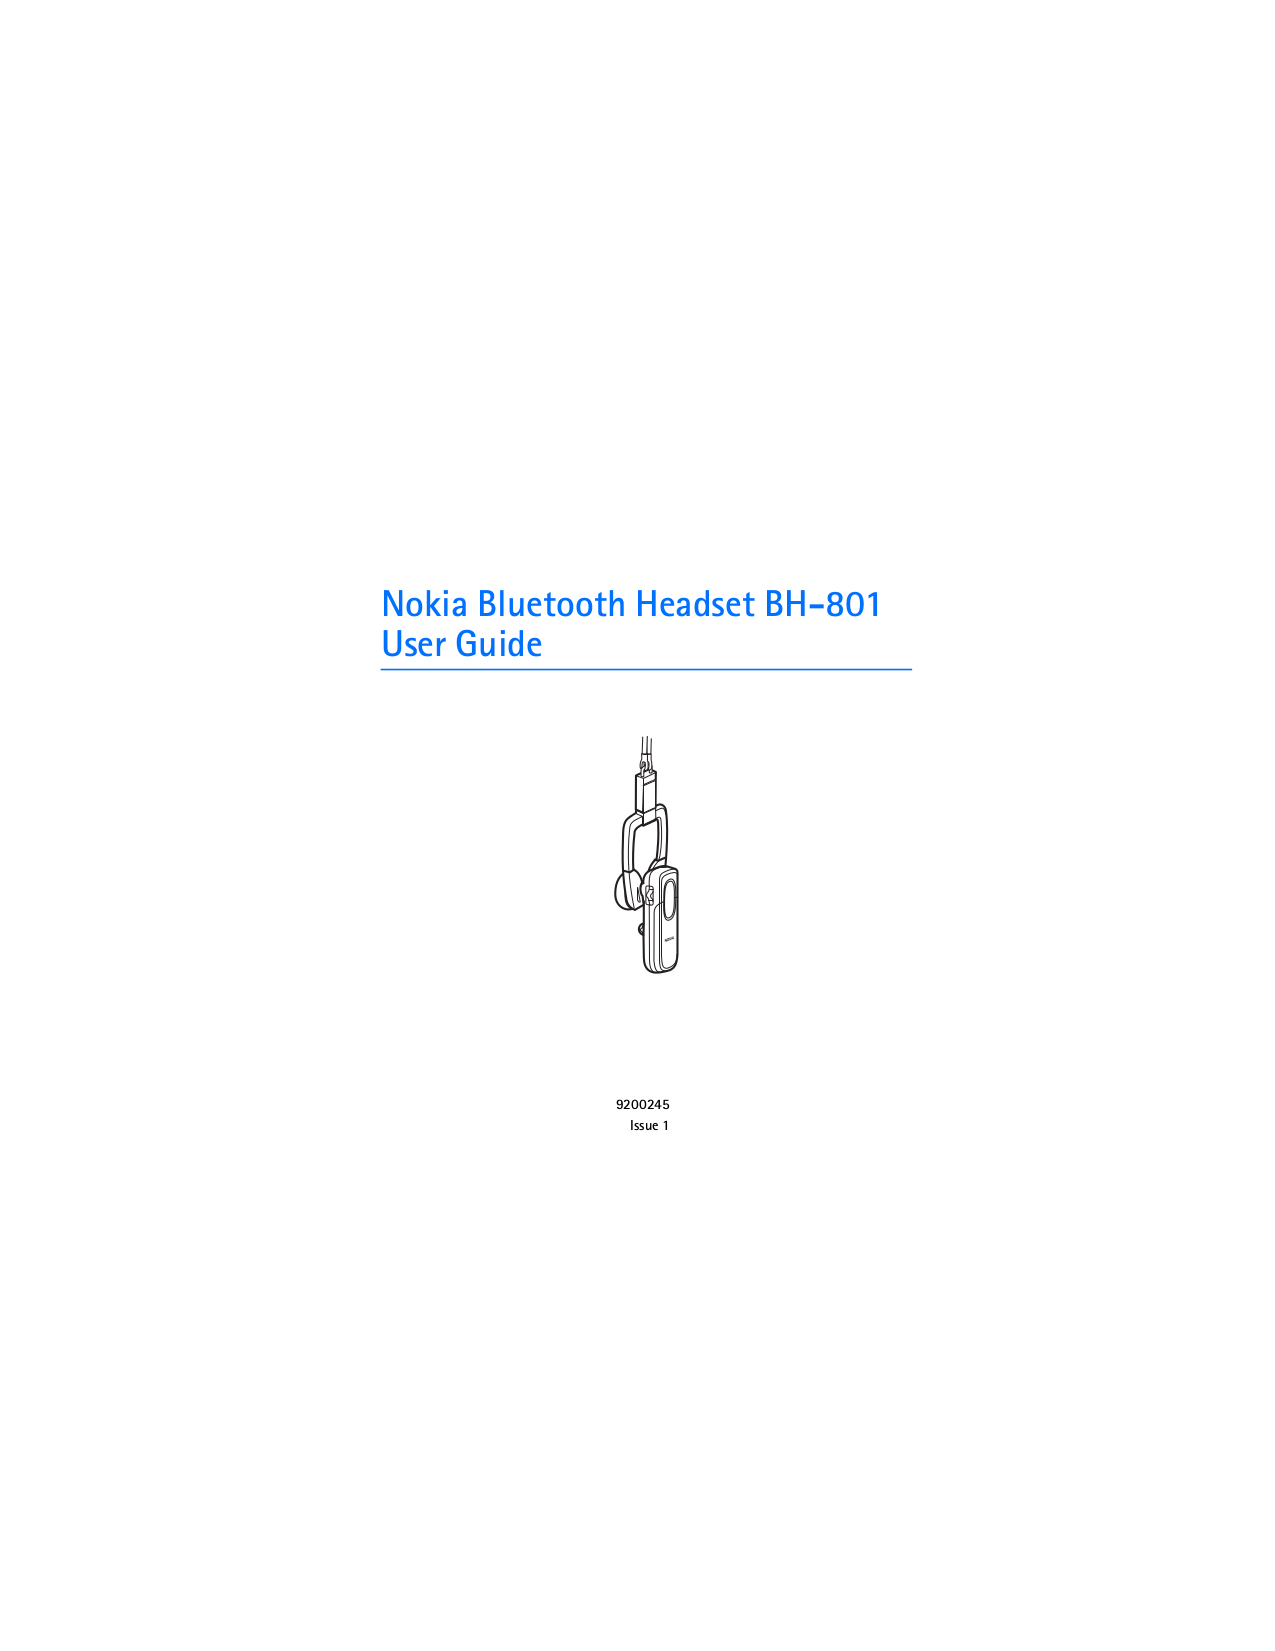 pdf for Nokia Headset BH-801 manual